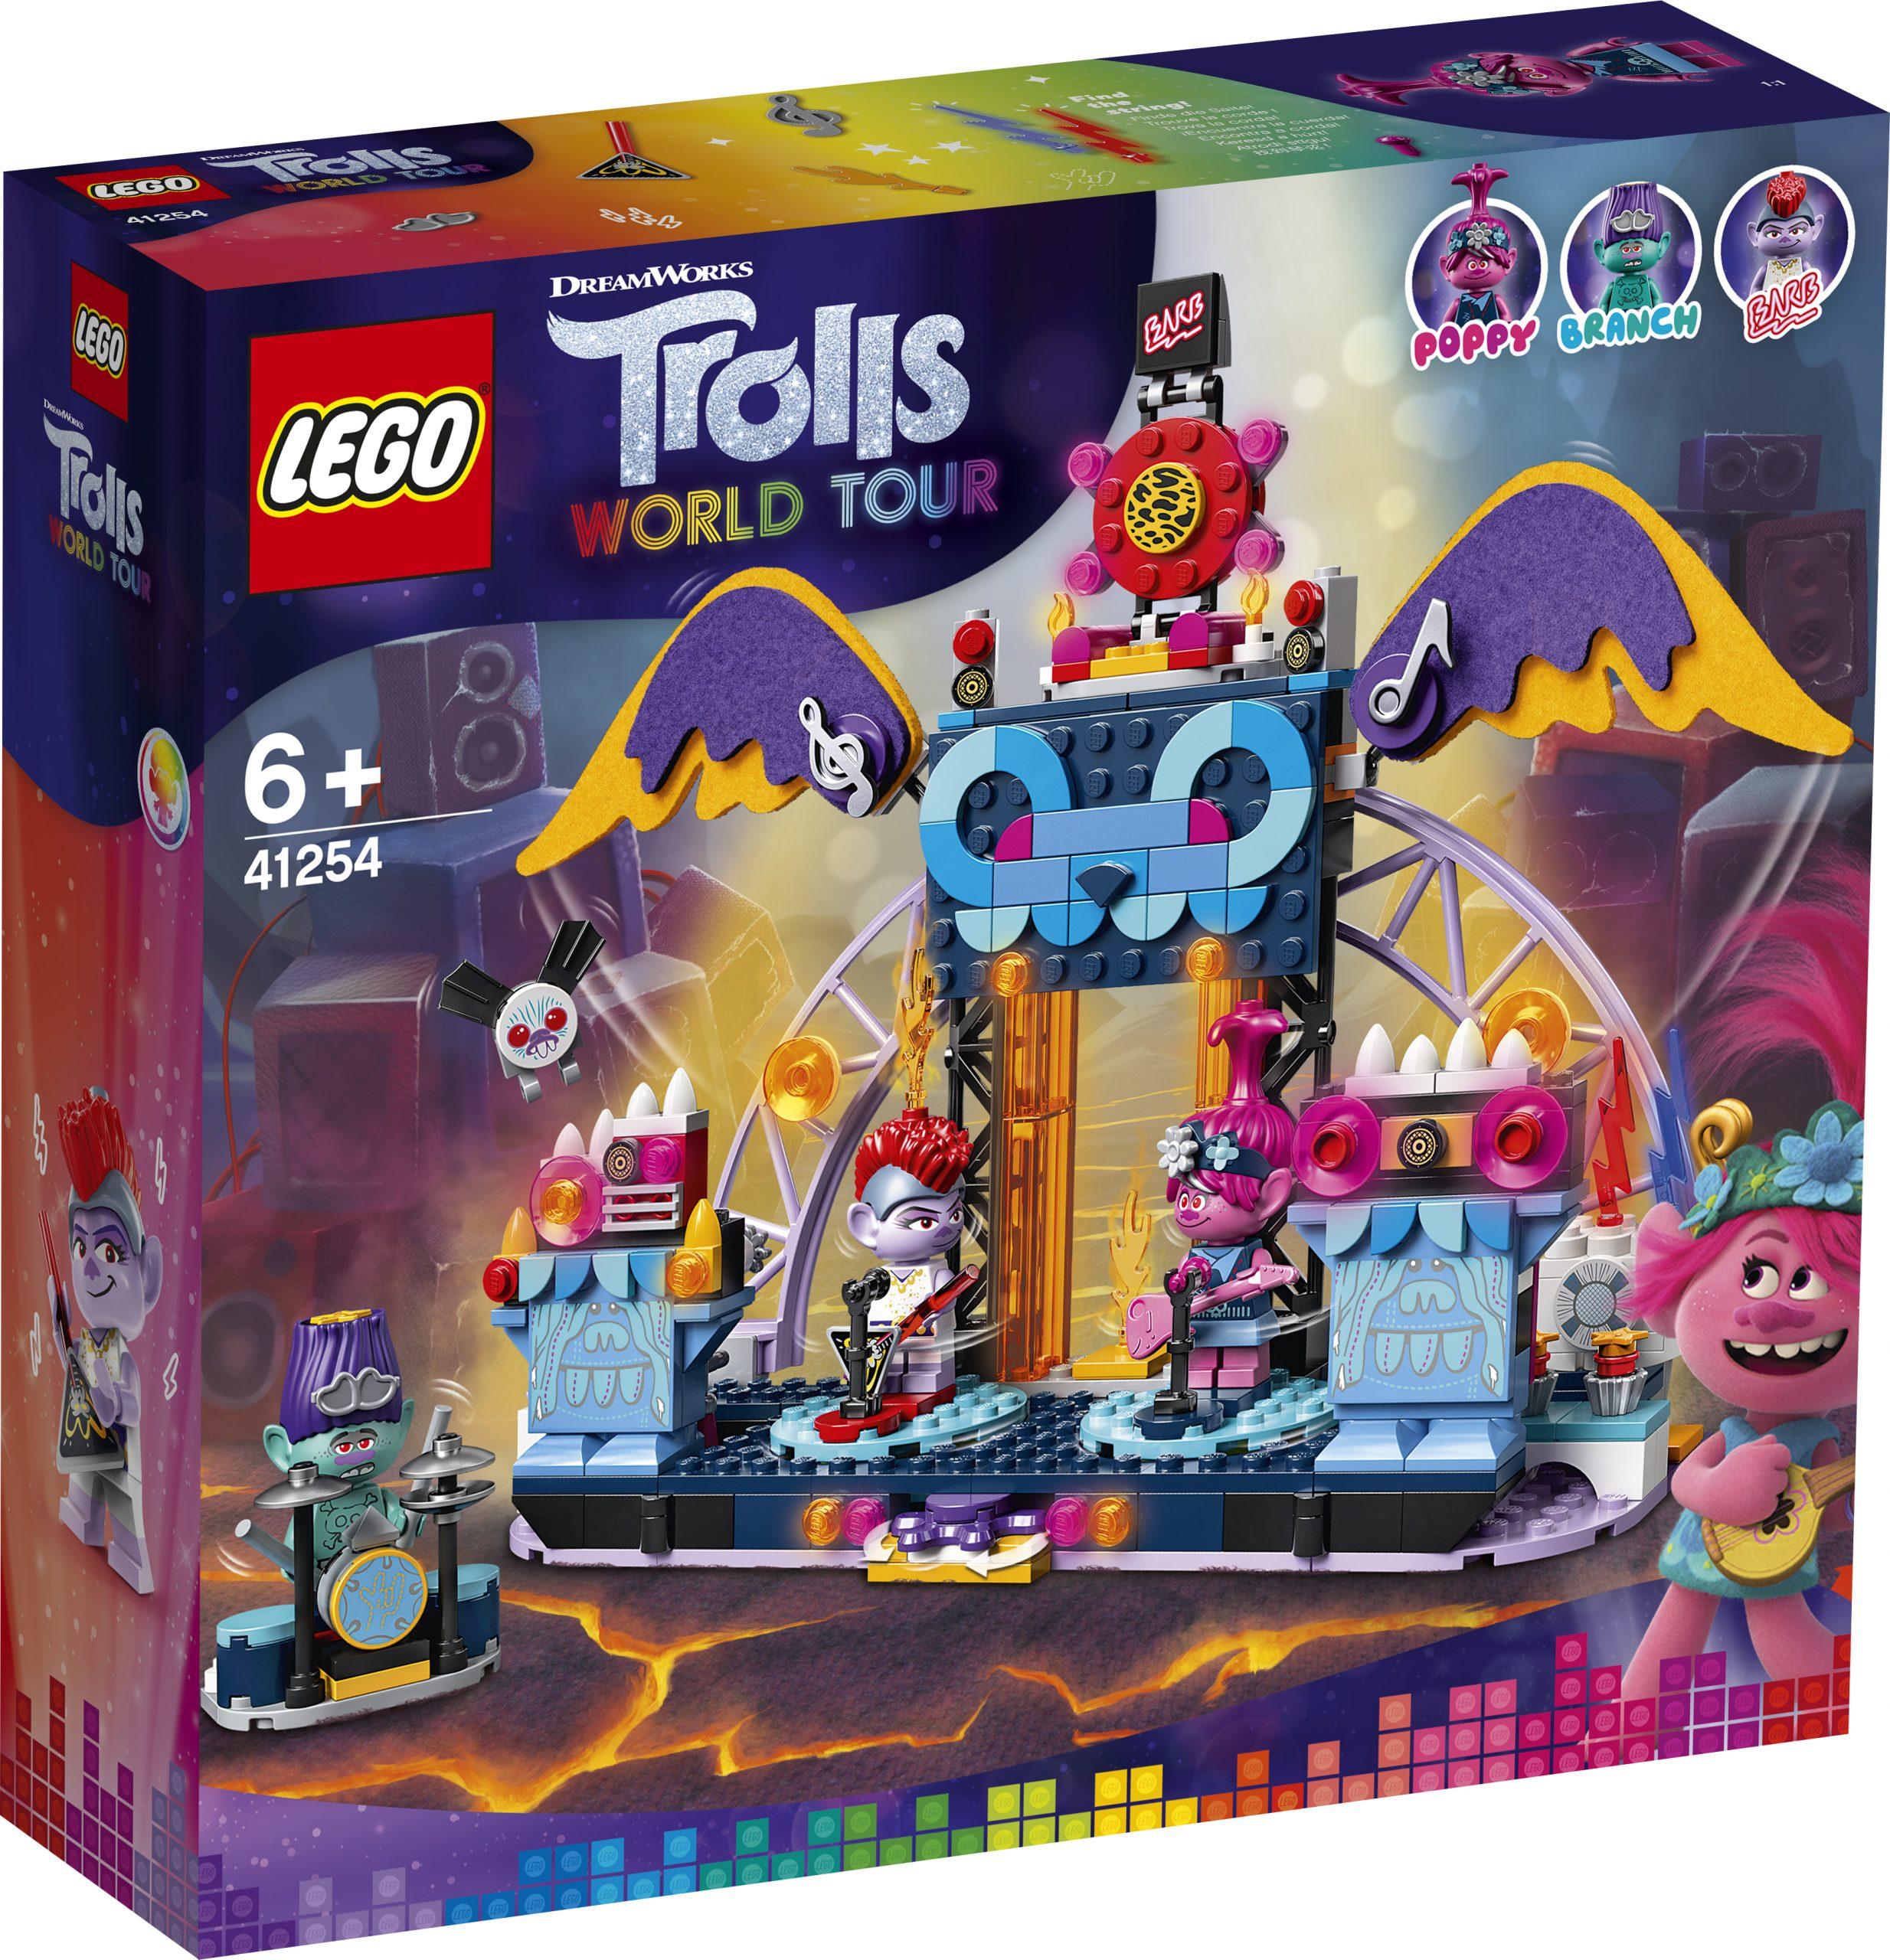 Lego Trolls World Tour Official Box Art Images The Brick Fan